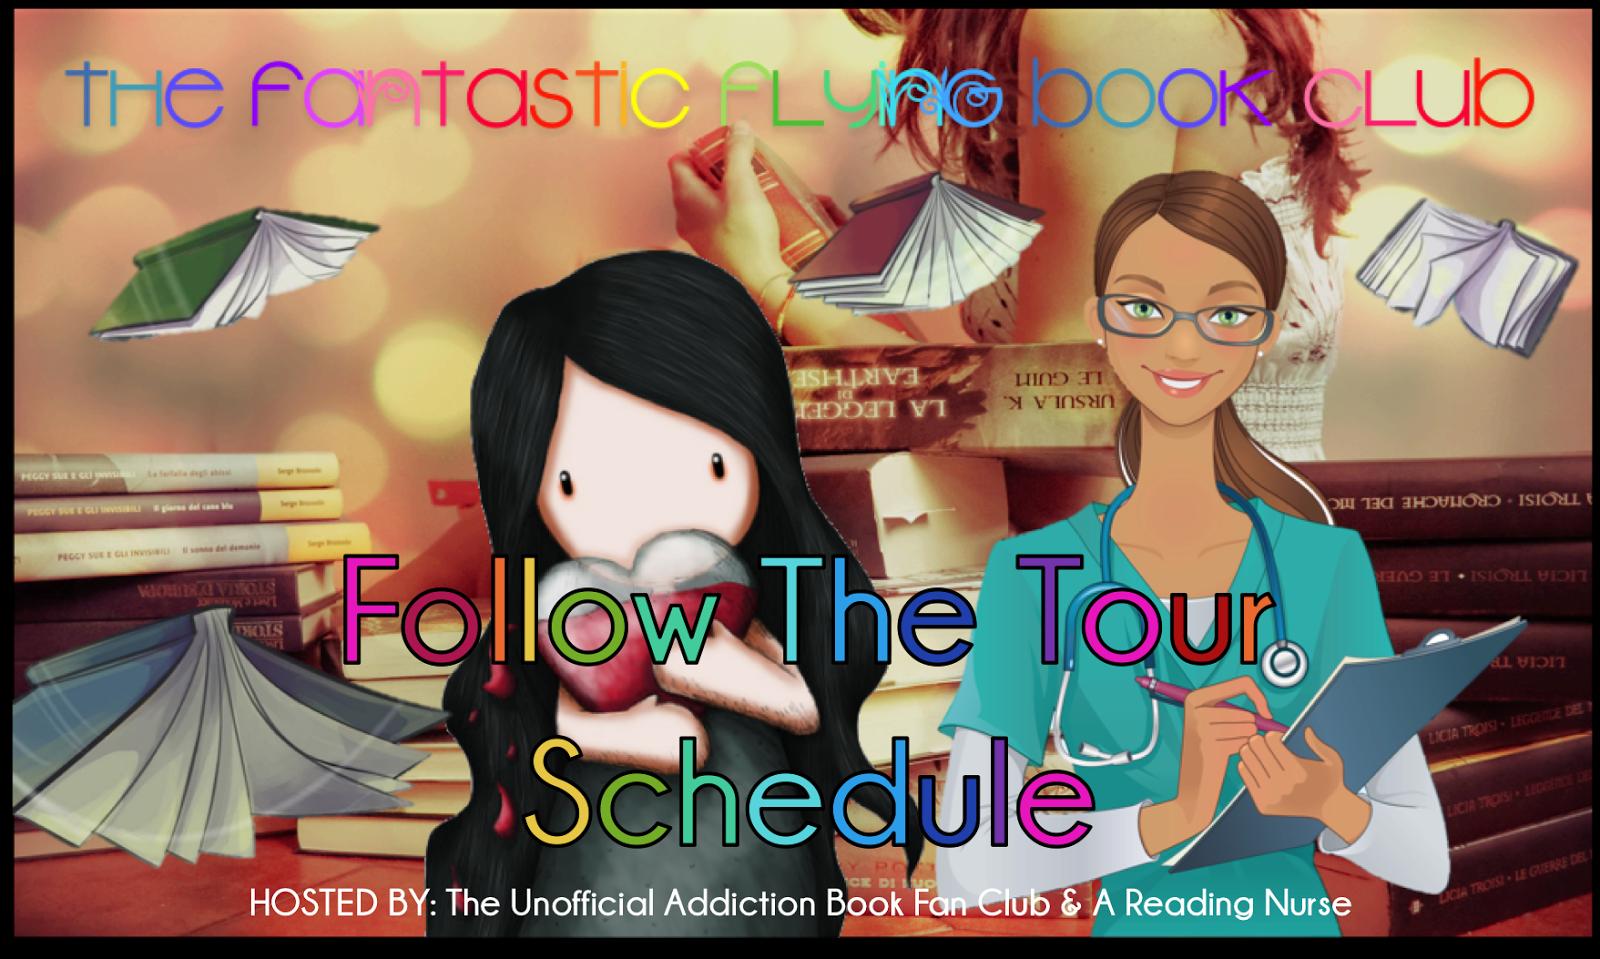 http://theunofficialaddictionbookfanclub.blogspot.com/2014/06/ffbc-blog-tour-scandal-by-sarah-ockler.html